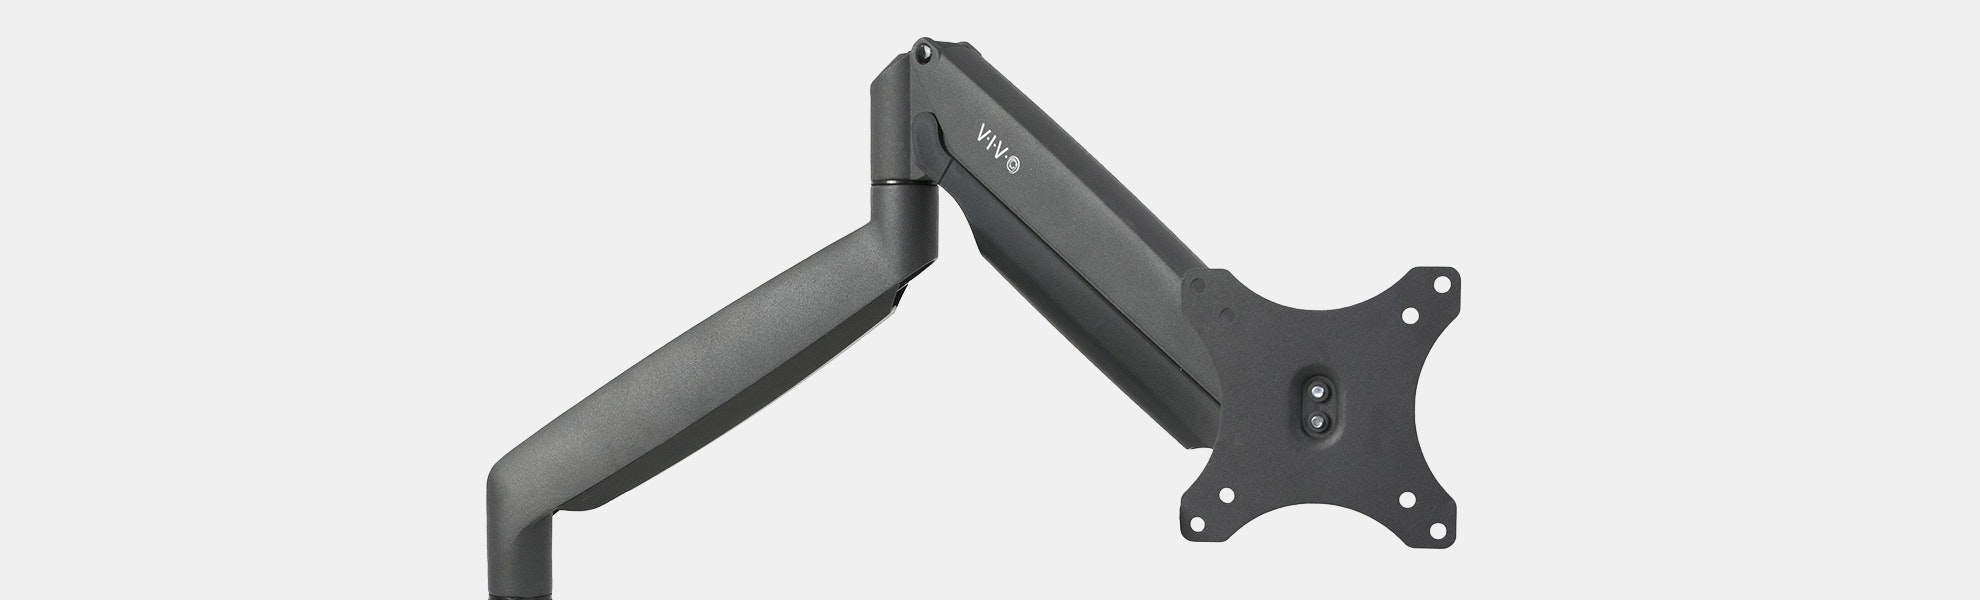 Vivo Aluminum Single Gas Spring Monitor Desk Arm